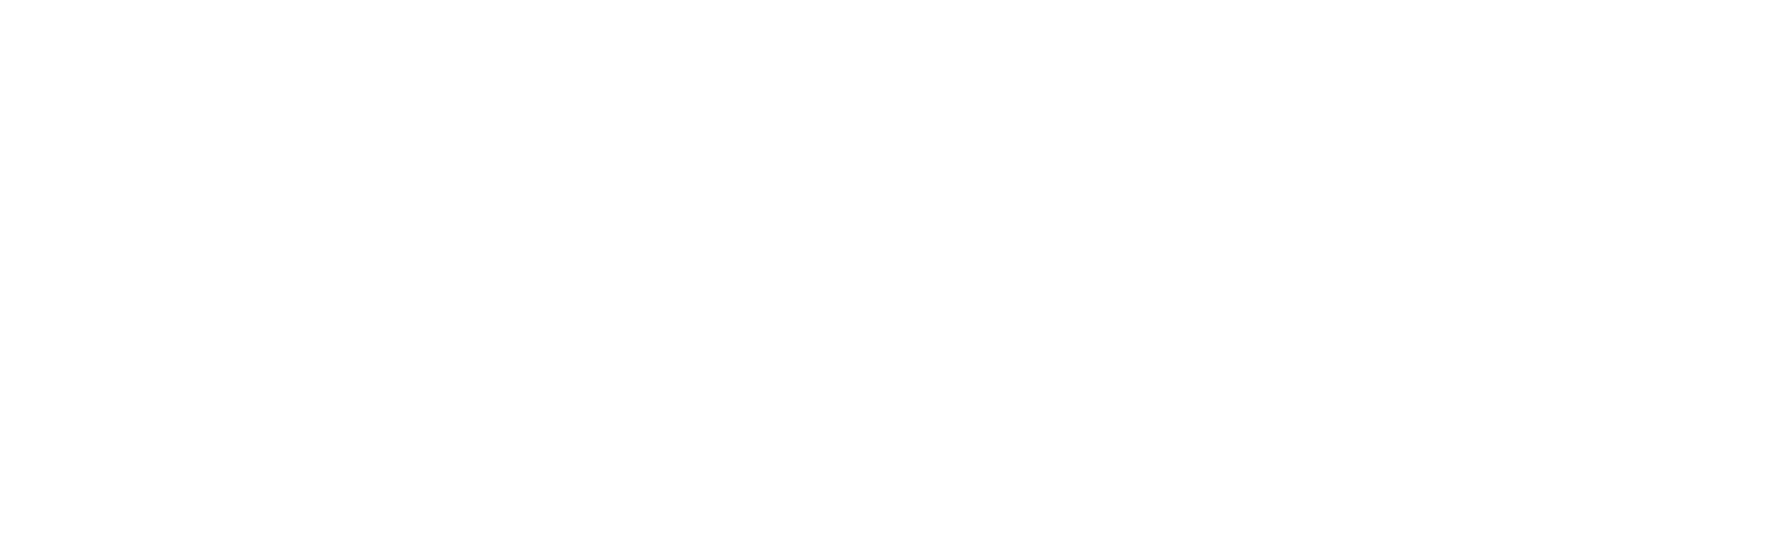 Greencube logo